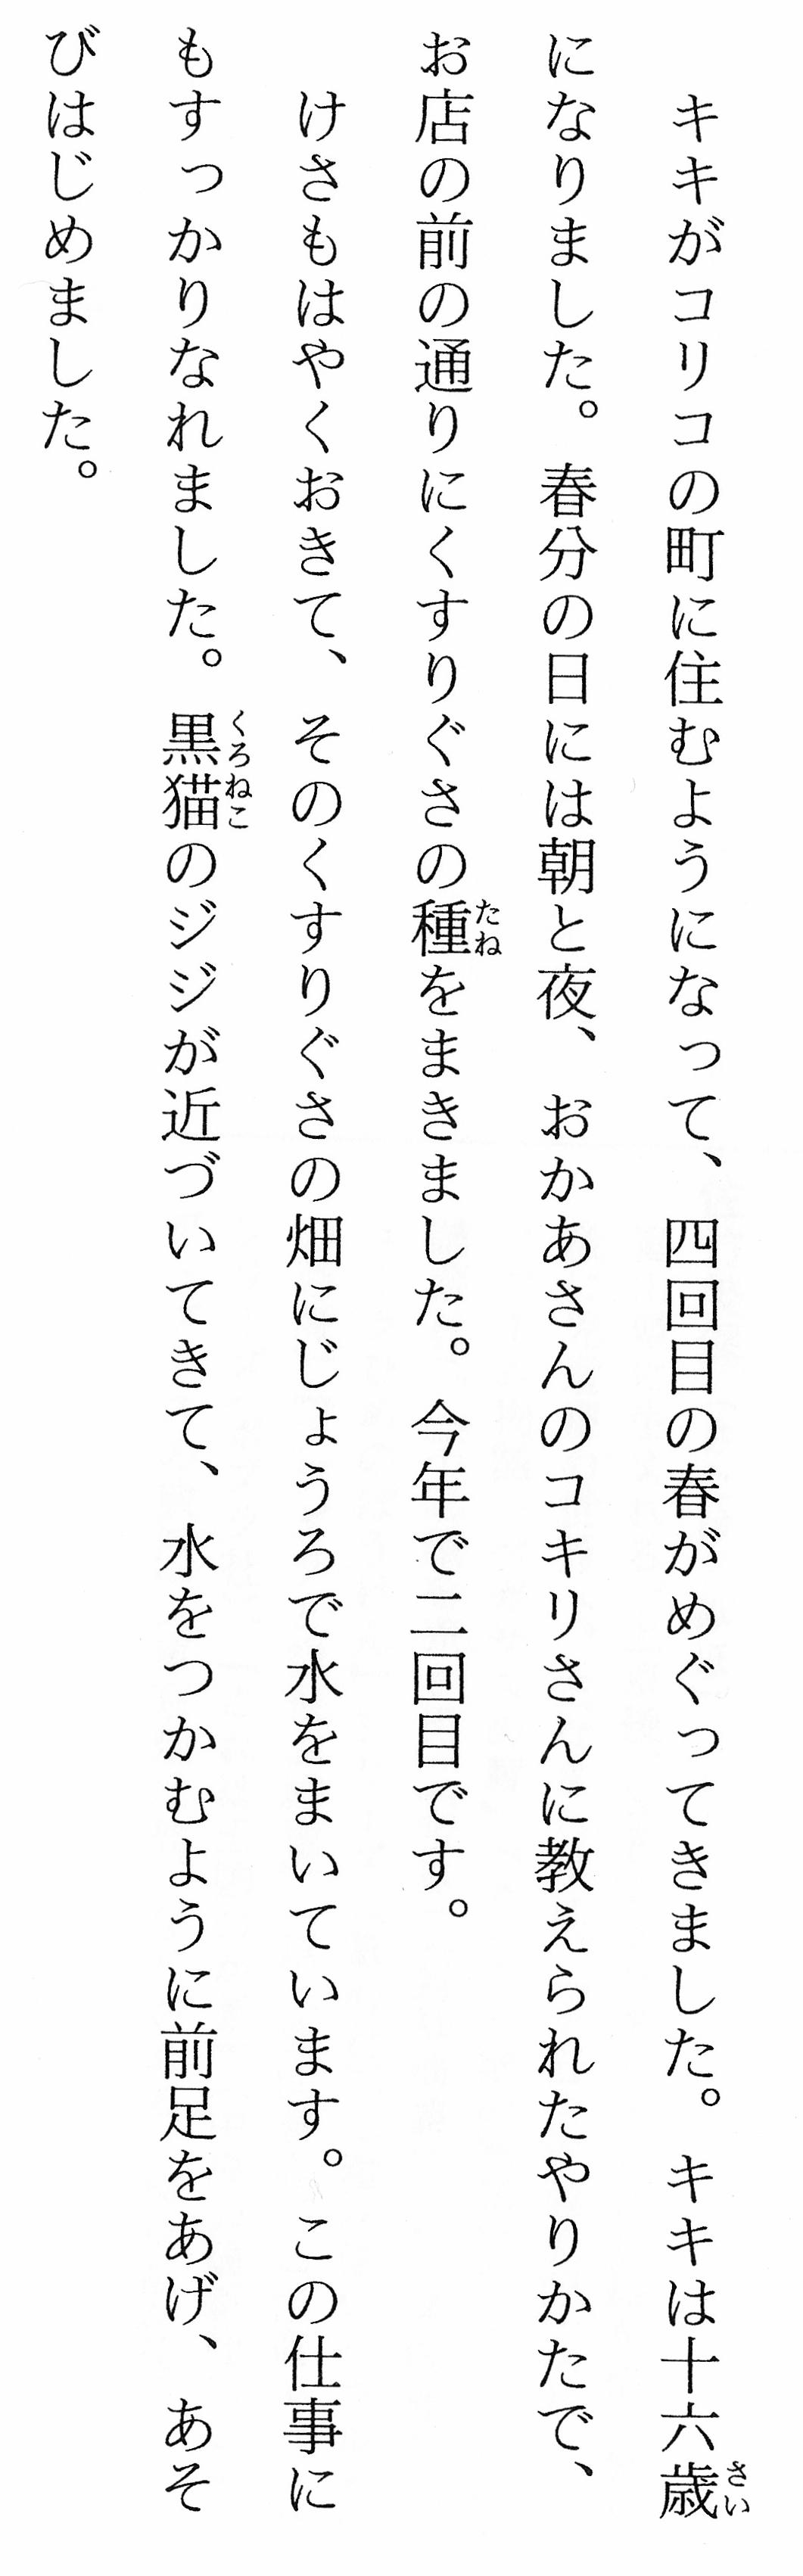 4_魔女の宅急便3_2000_p10.jpg